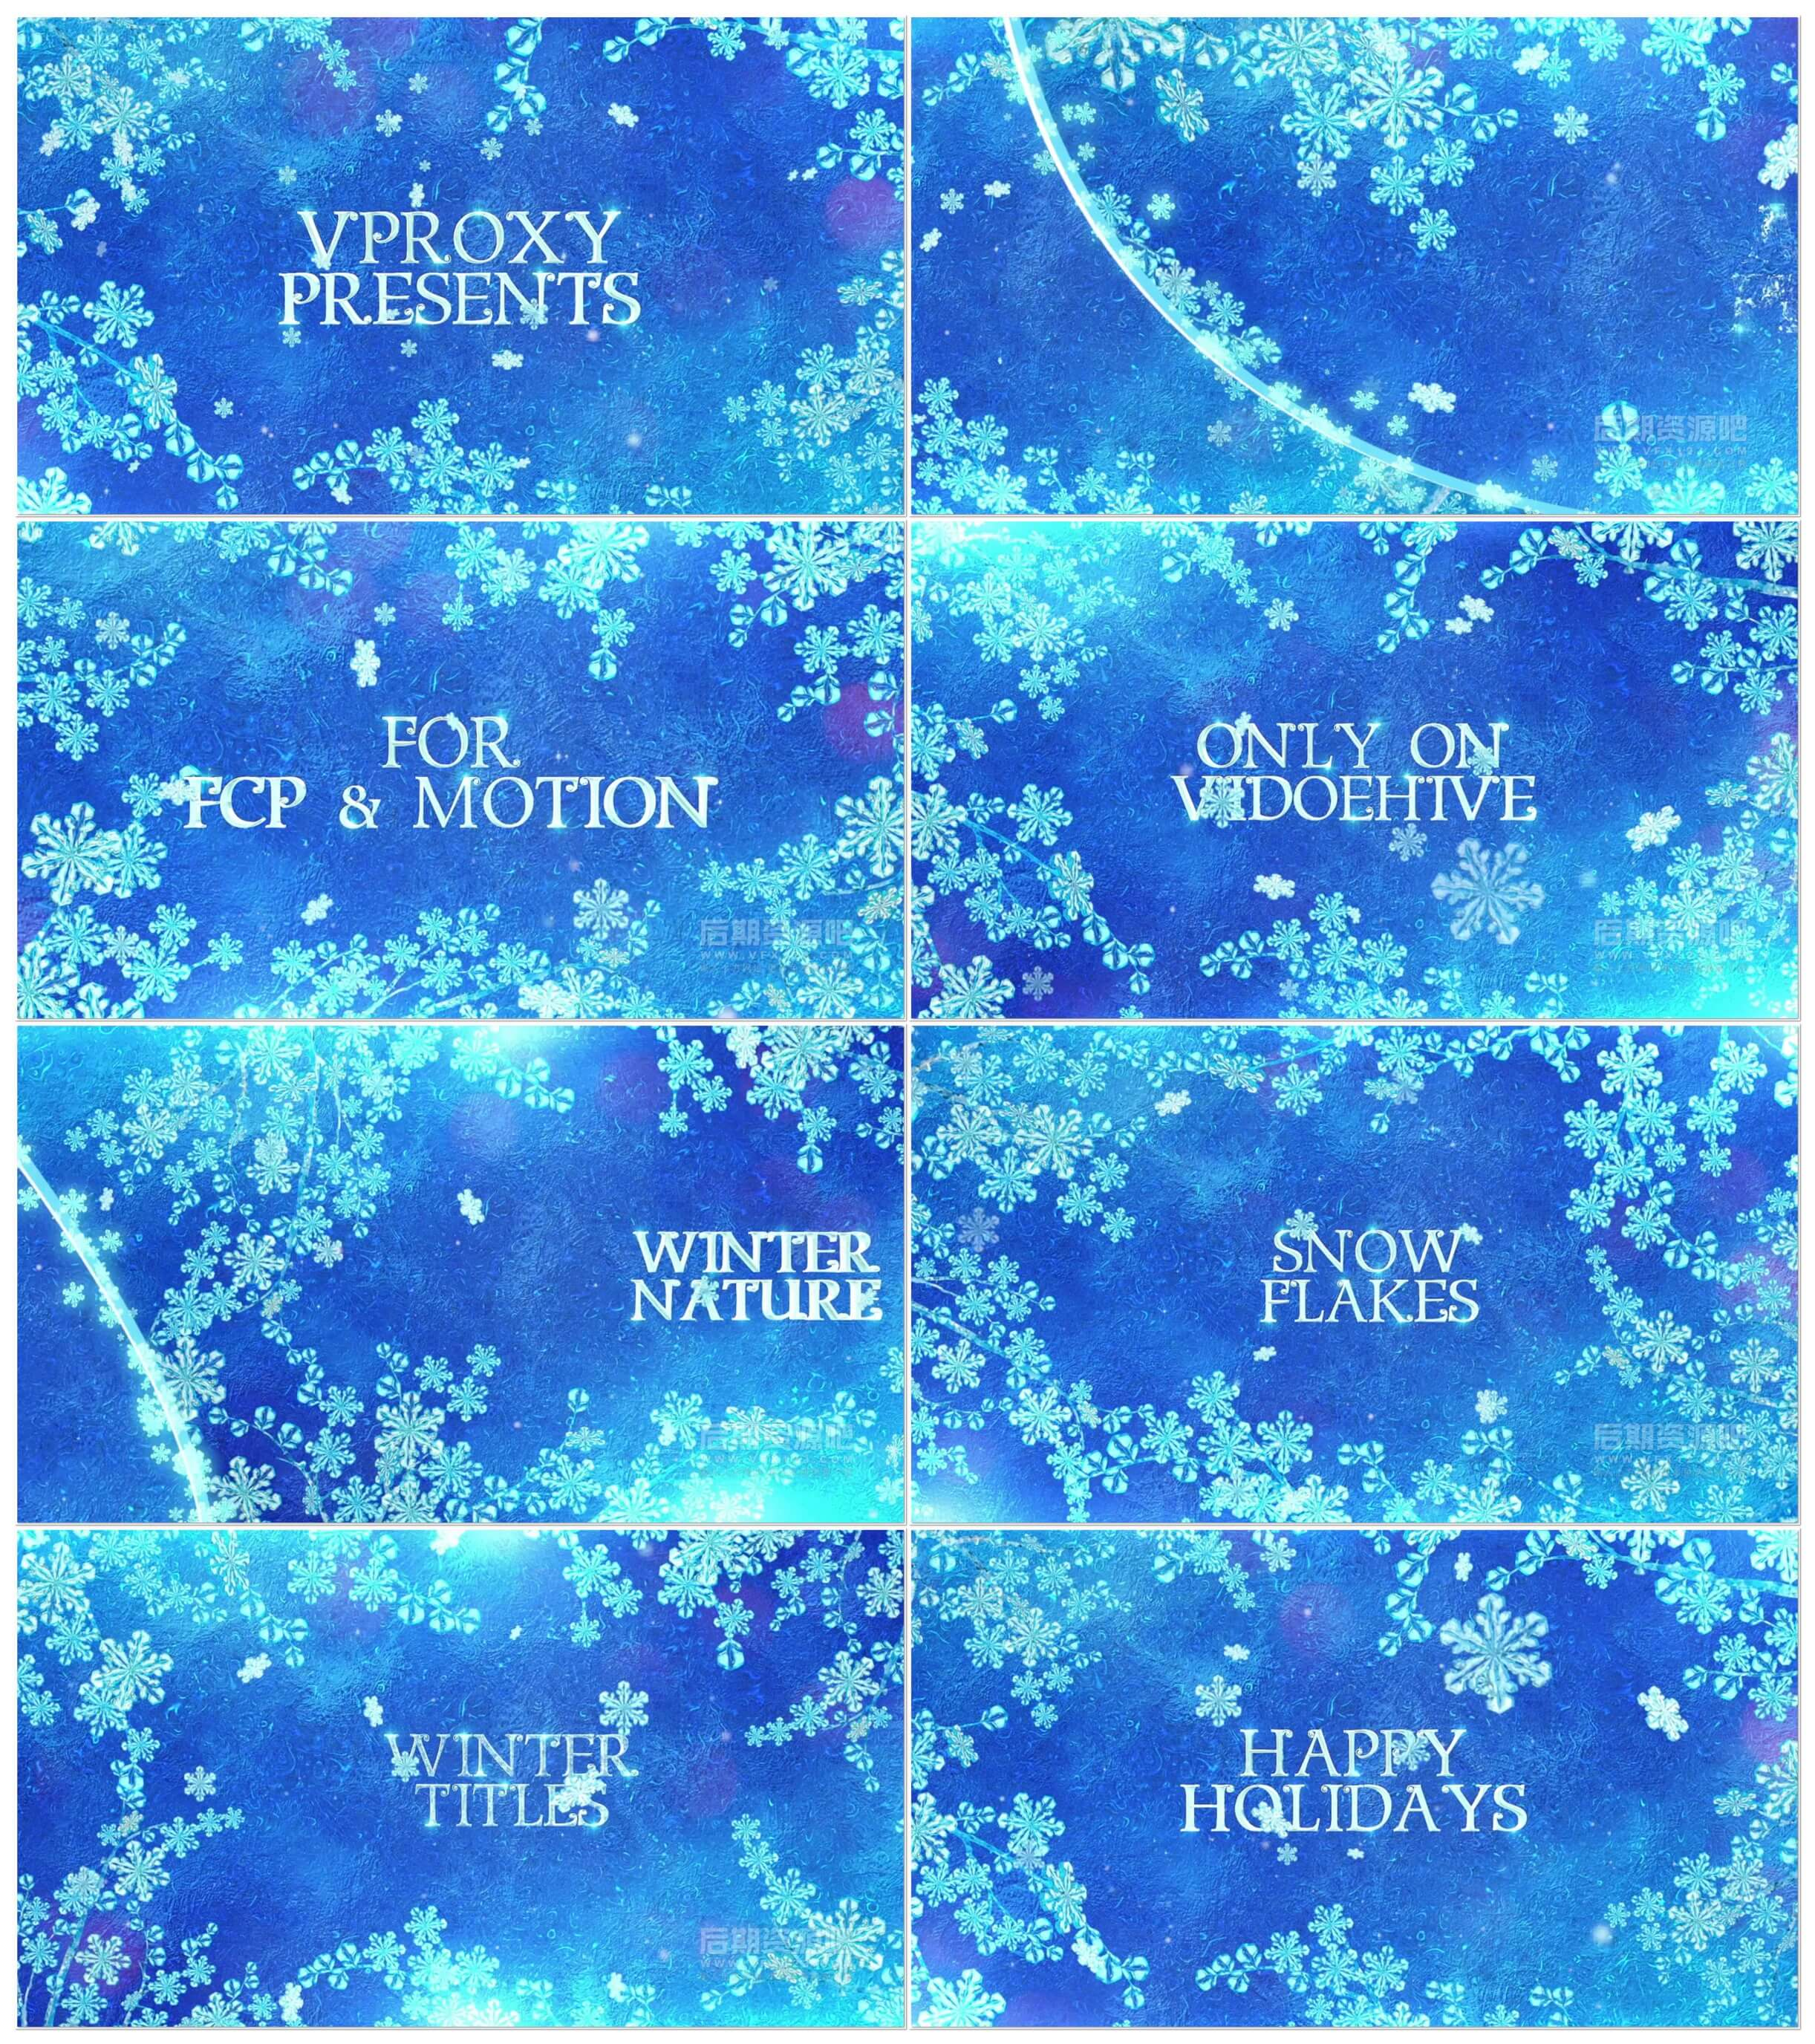 fcpx插件 冰凌雪花冬日祝福圣诞节新年片头模板 Winter Titles